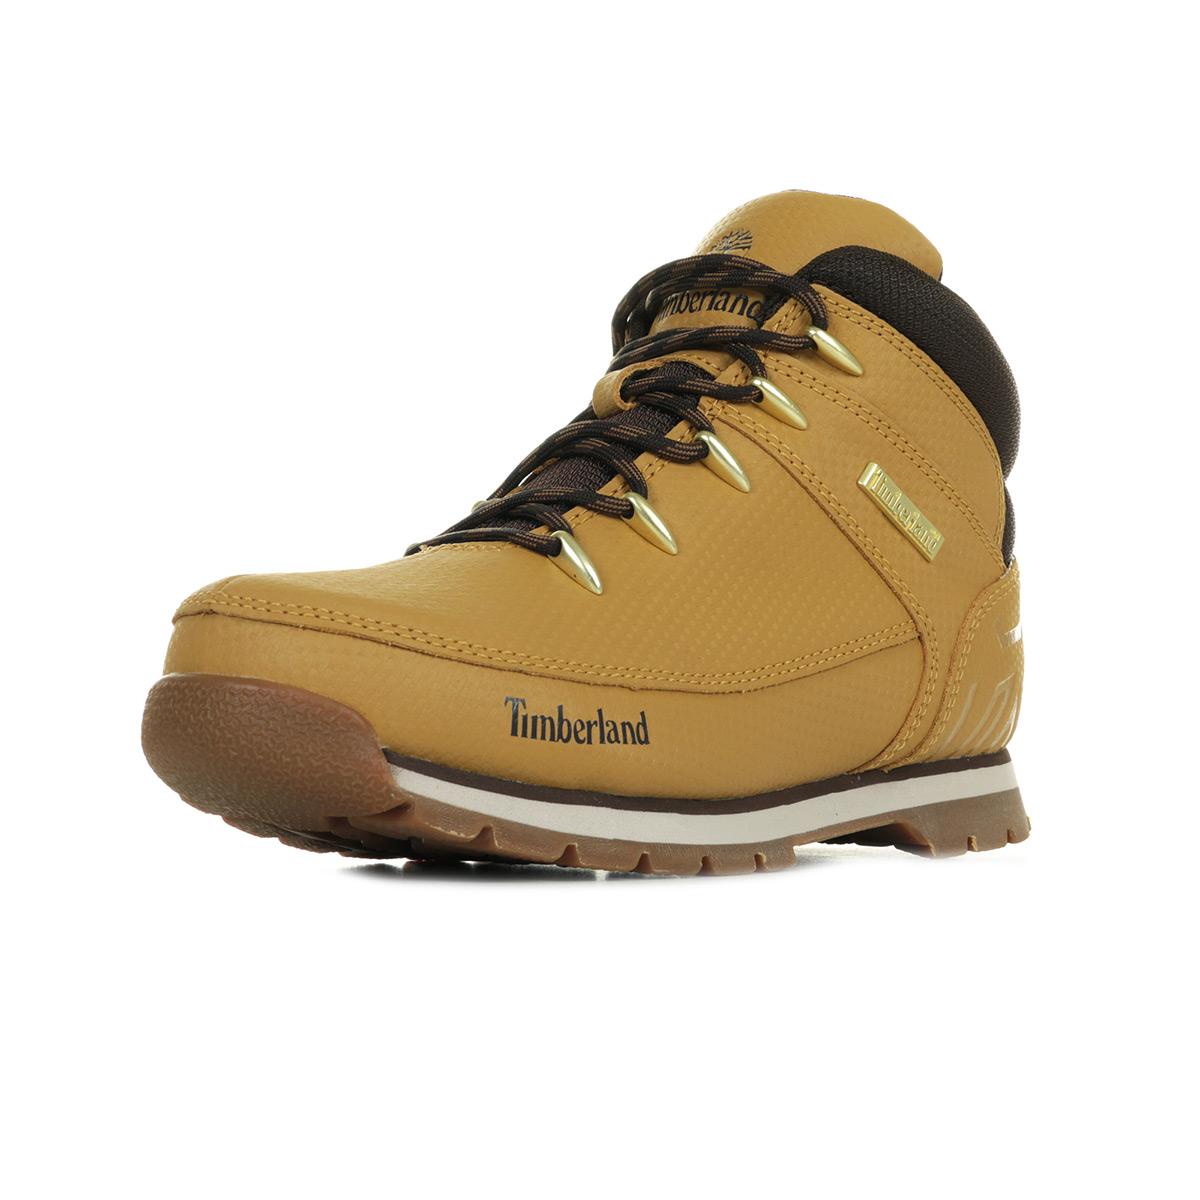 Détails sur Chaussures Boots Timberland homme Euro Sprint Mid Hiker taille Marron Nubuck